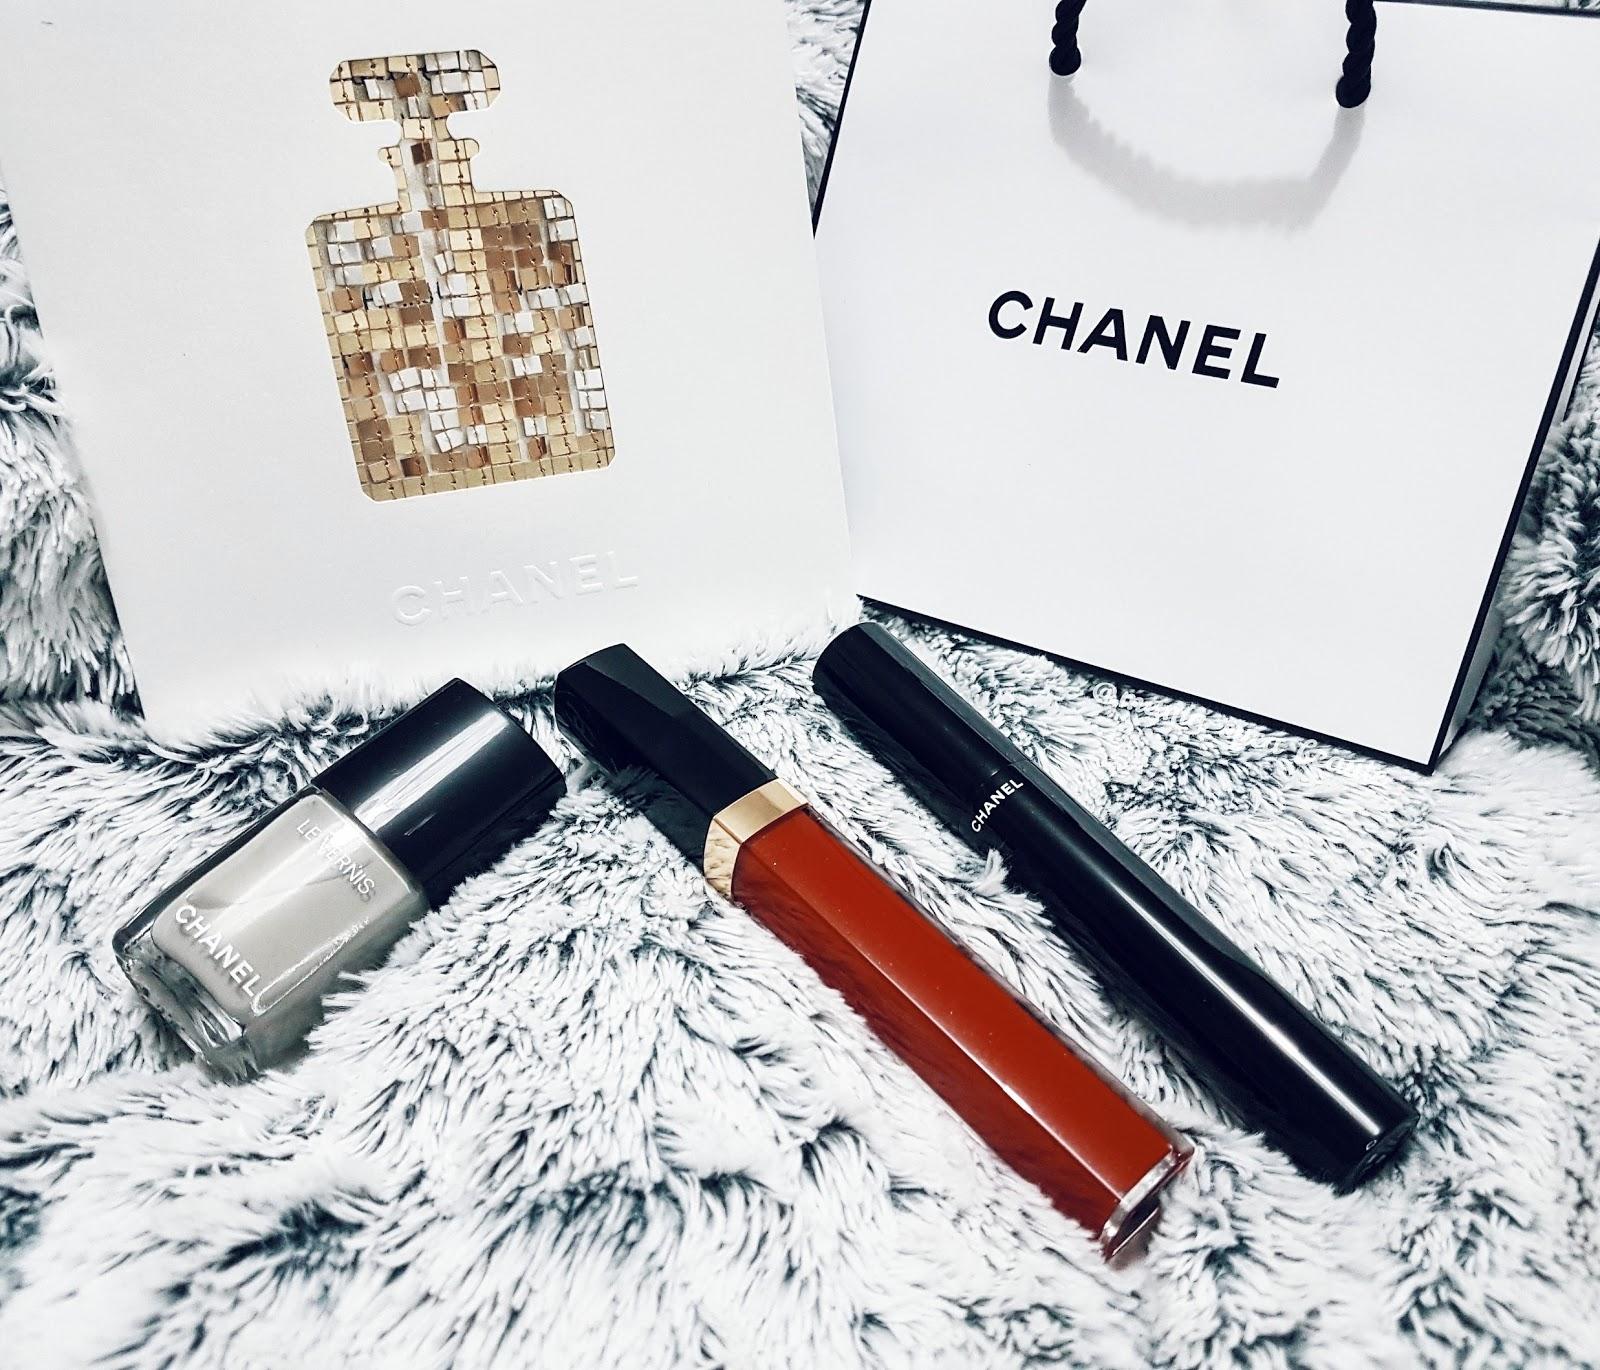 cadeau_chanel_passion_beaute_mama_syca_beaute